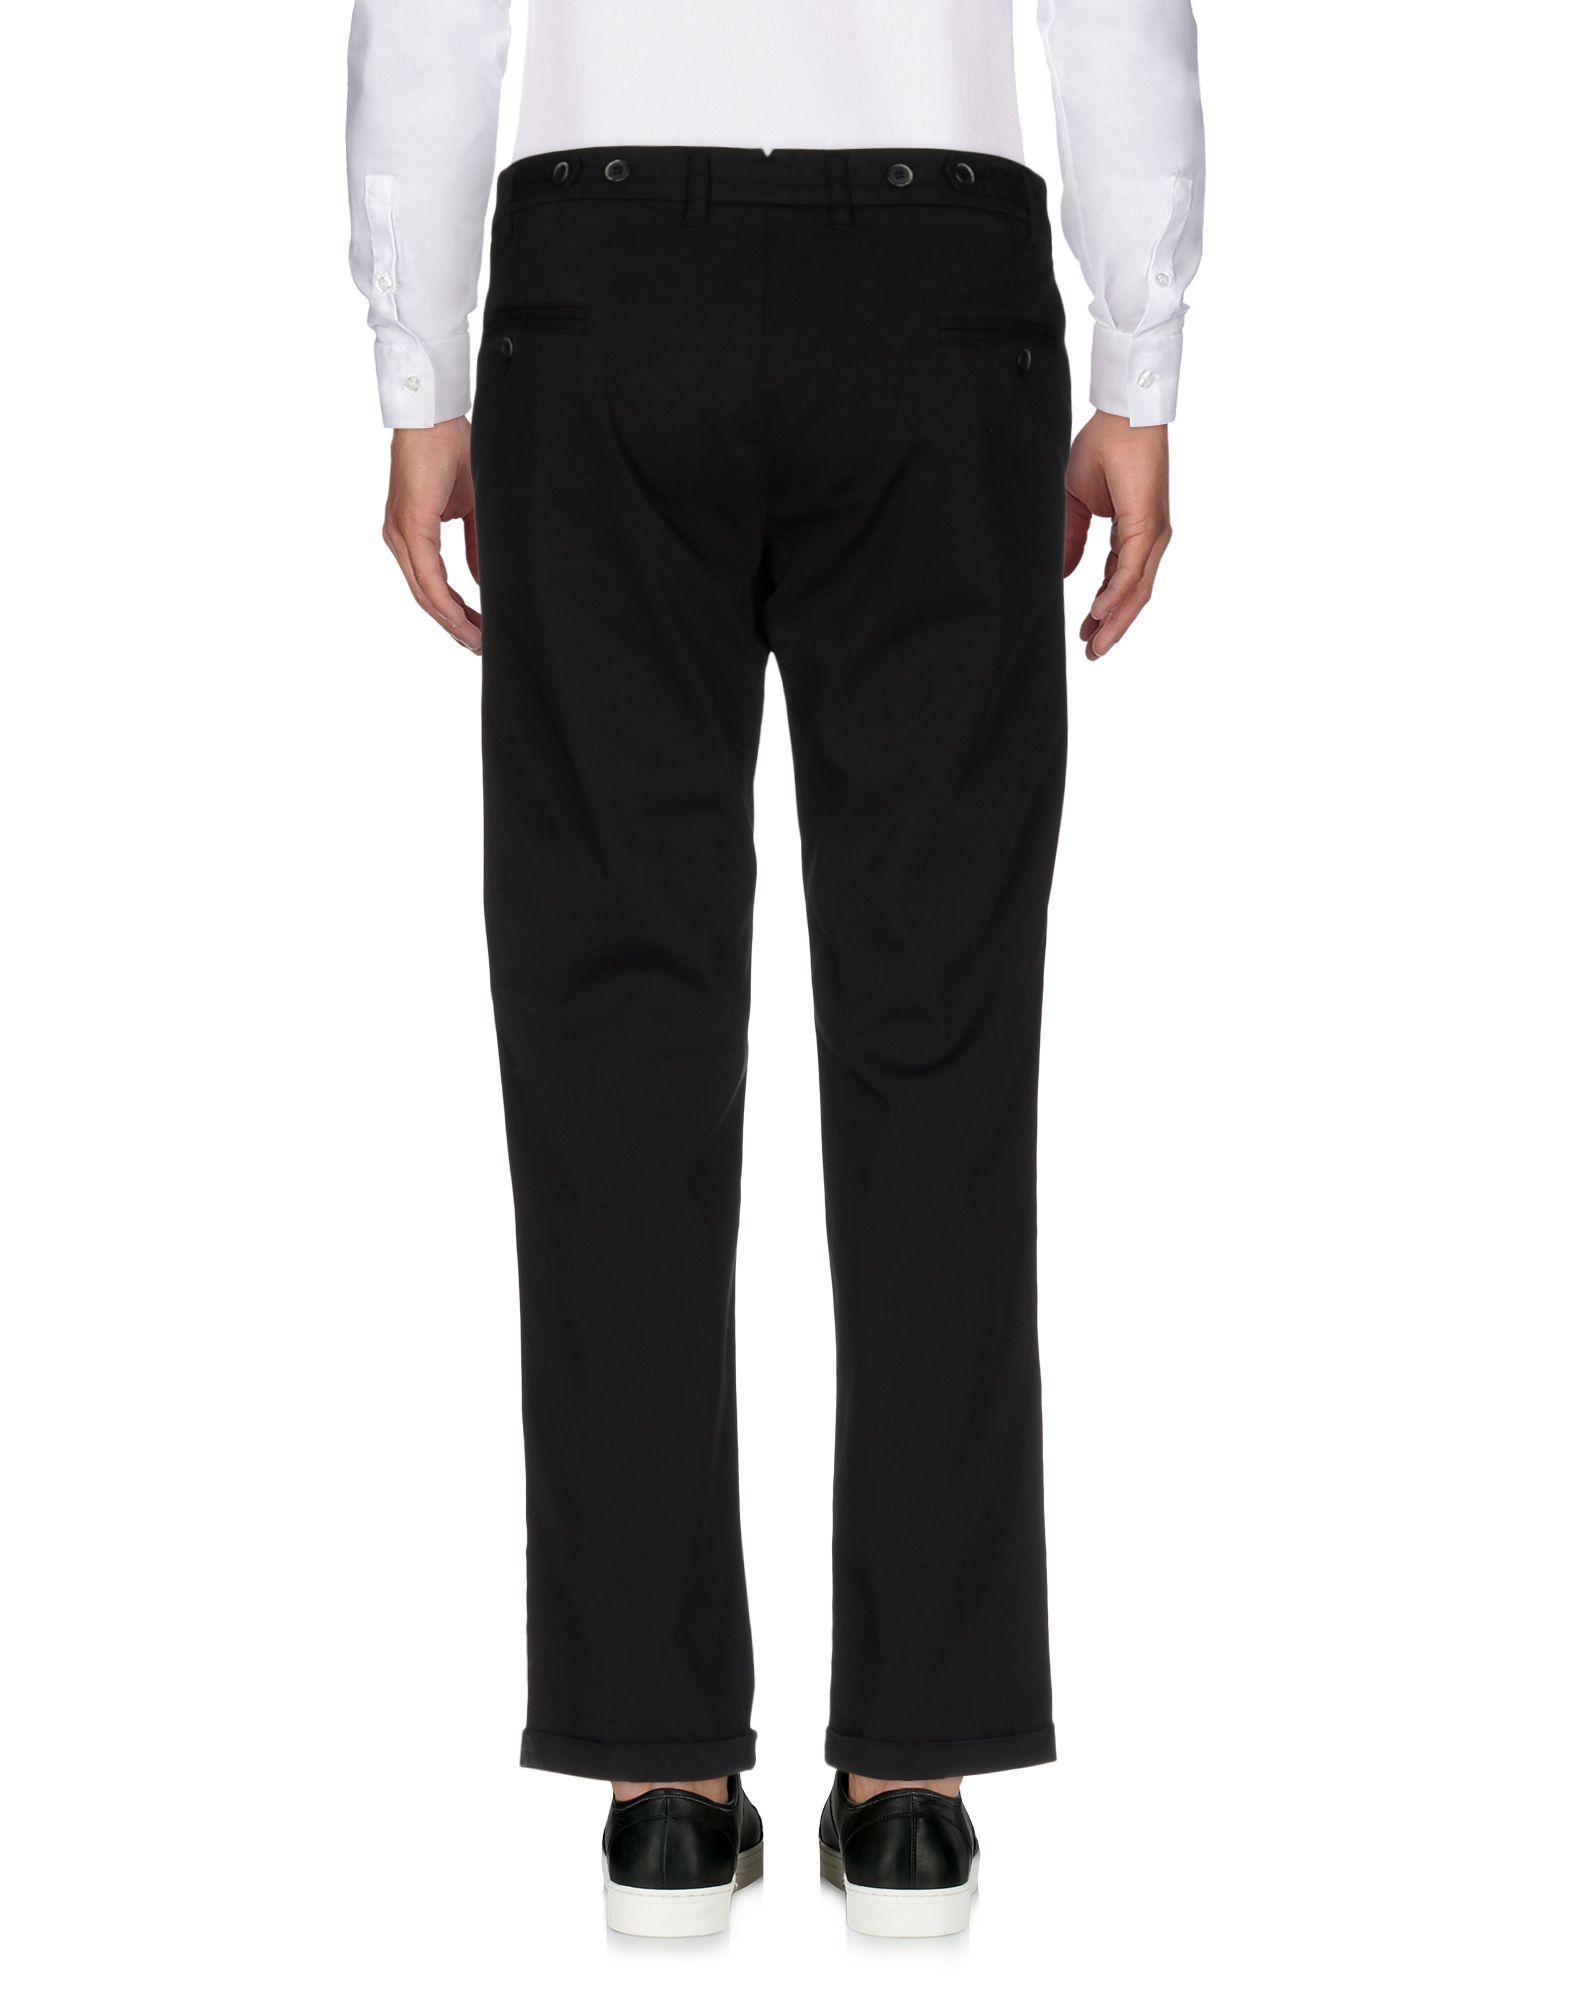 Barena Cotton Casual Pants in Black for Men